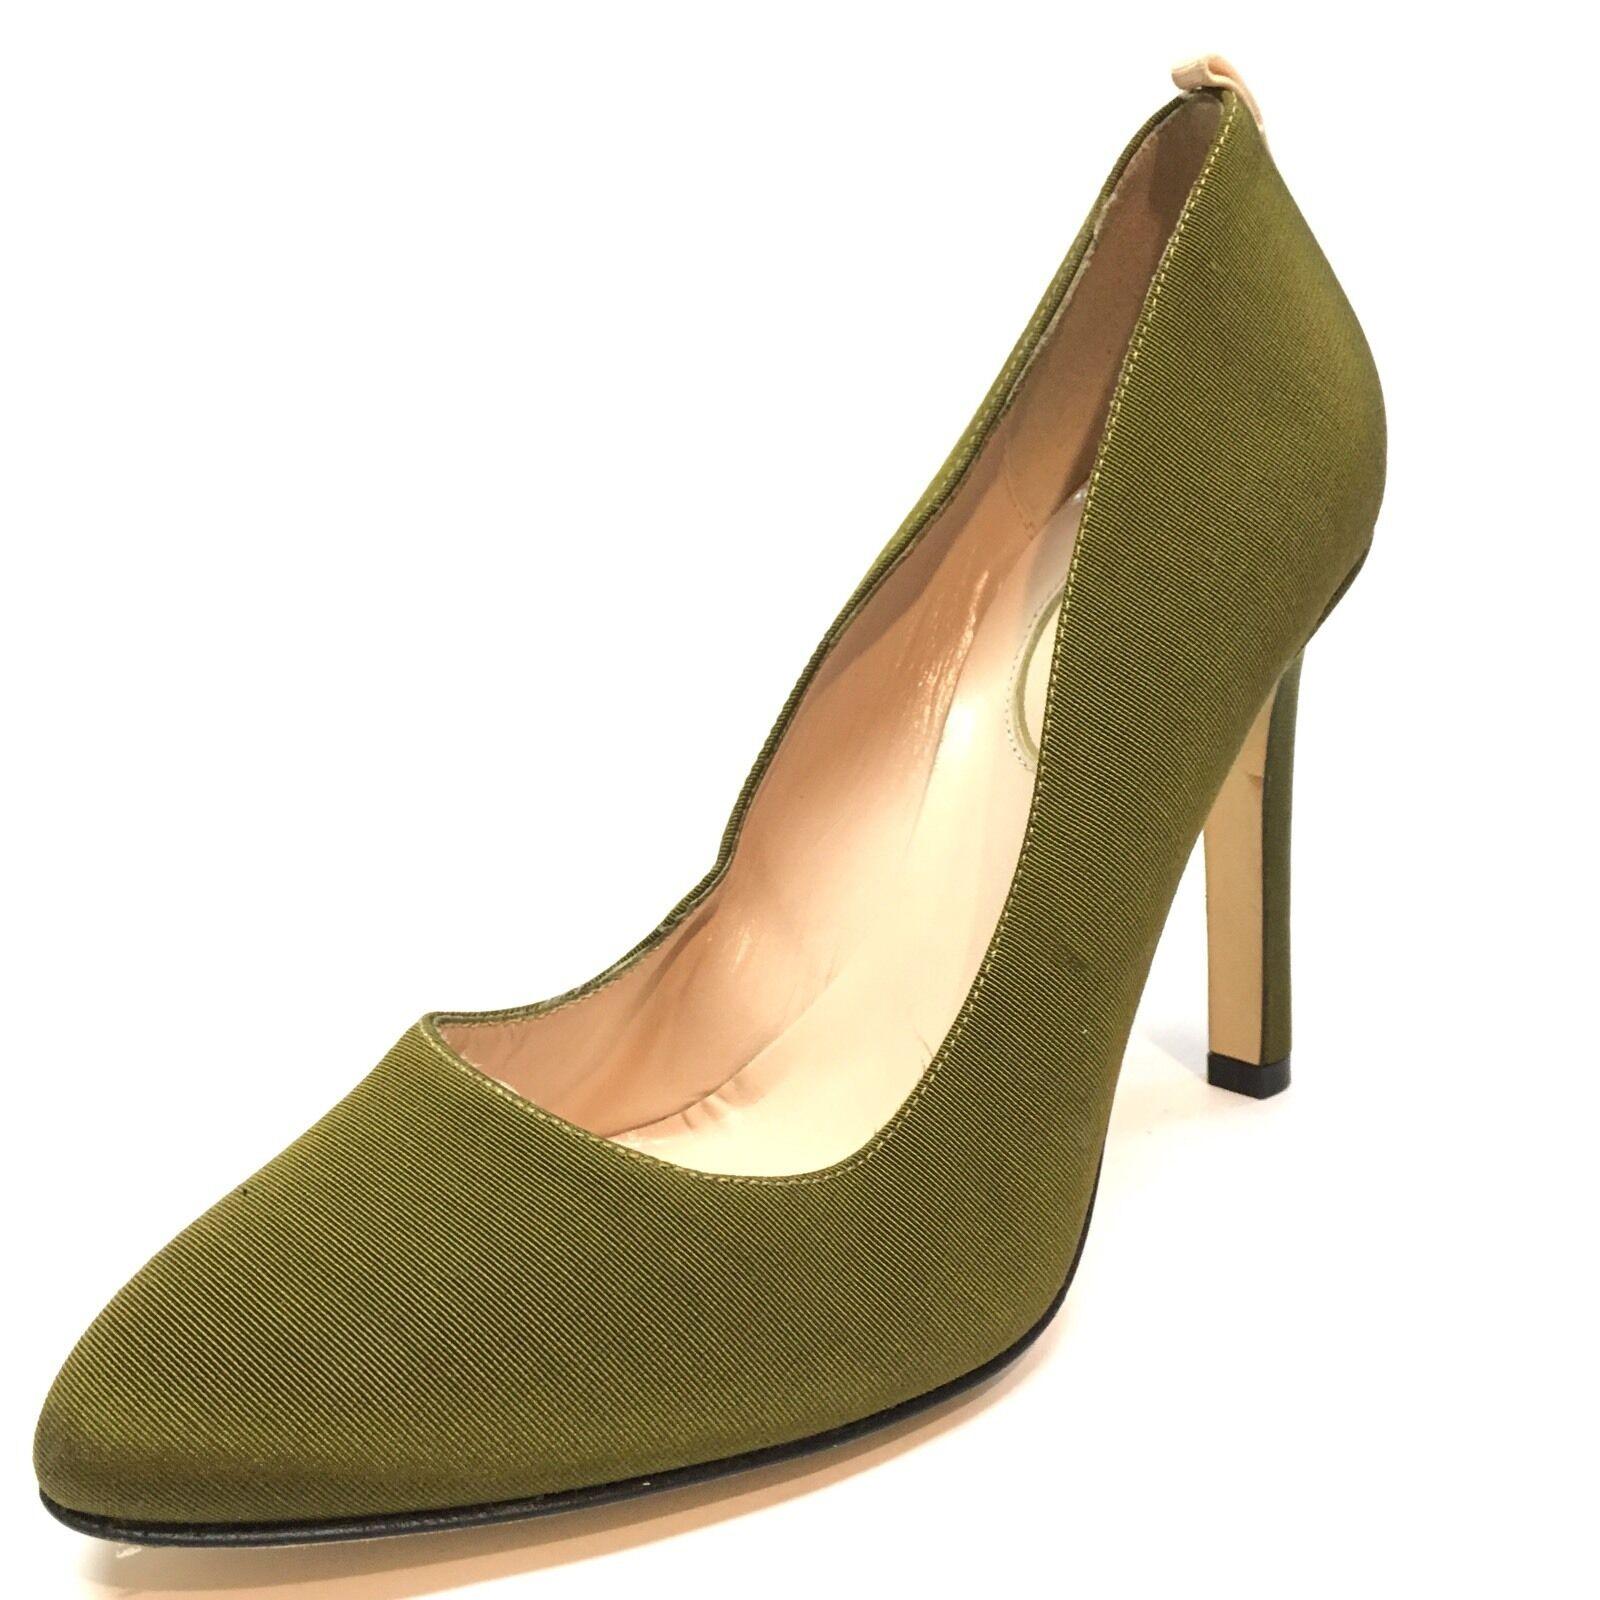 New SJP by Sarah Jessica Parker Lady femmes Olive Pumps Heels Taille 35.5 M